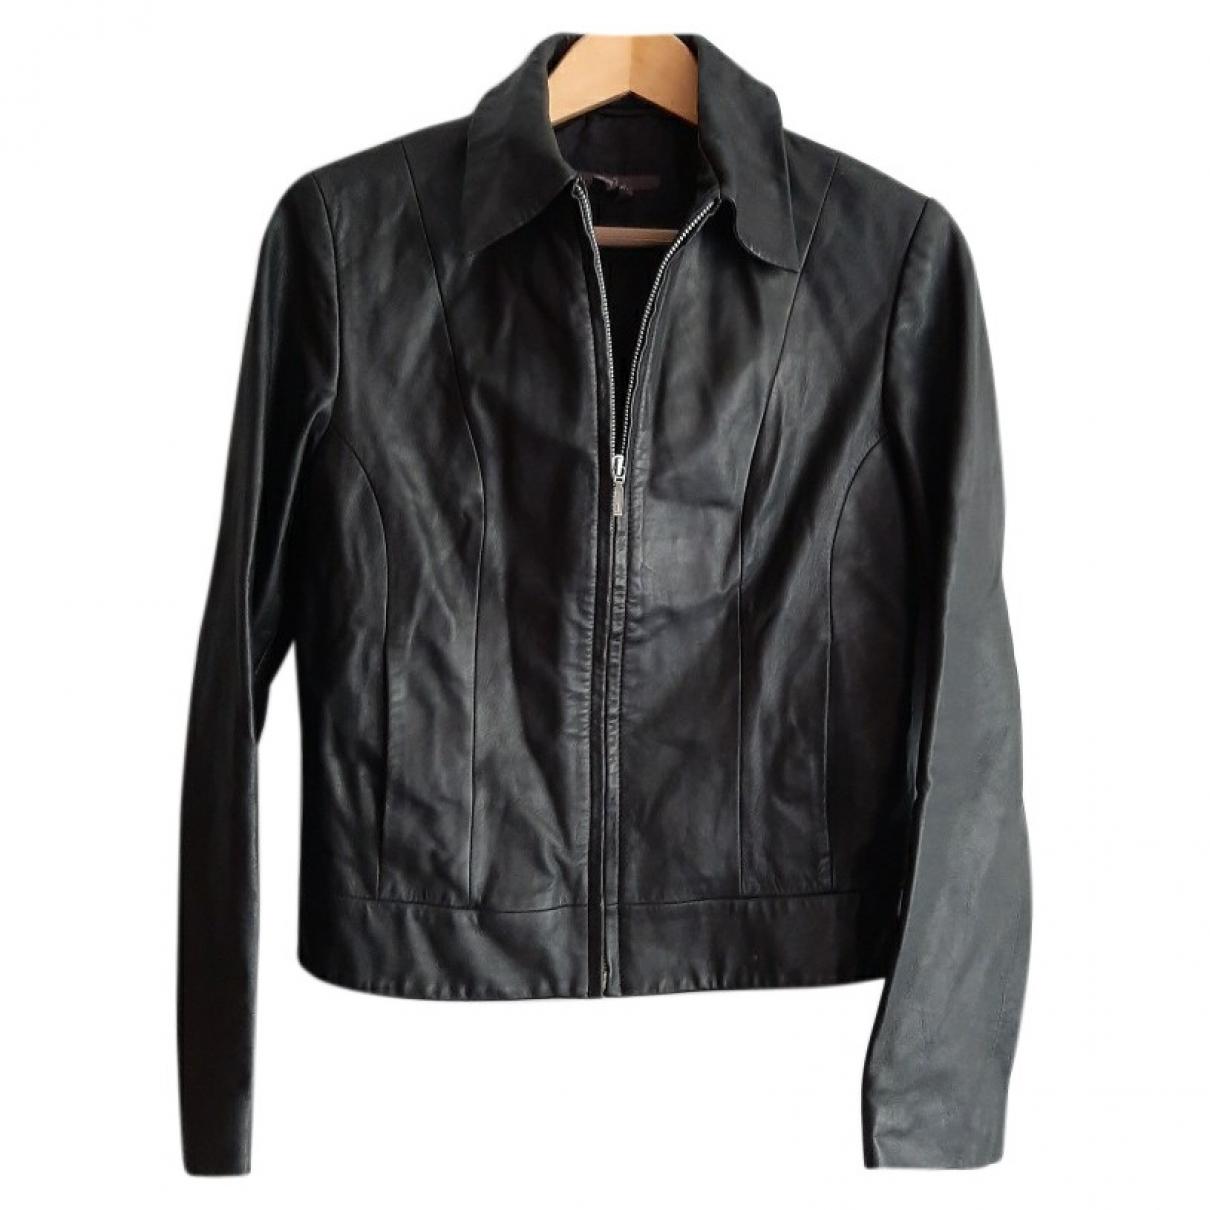 Zara \N Black Shearling Leather jacket for Women M International